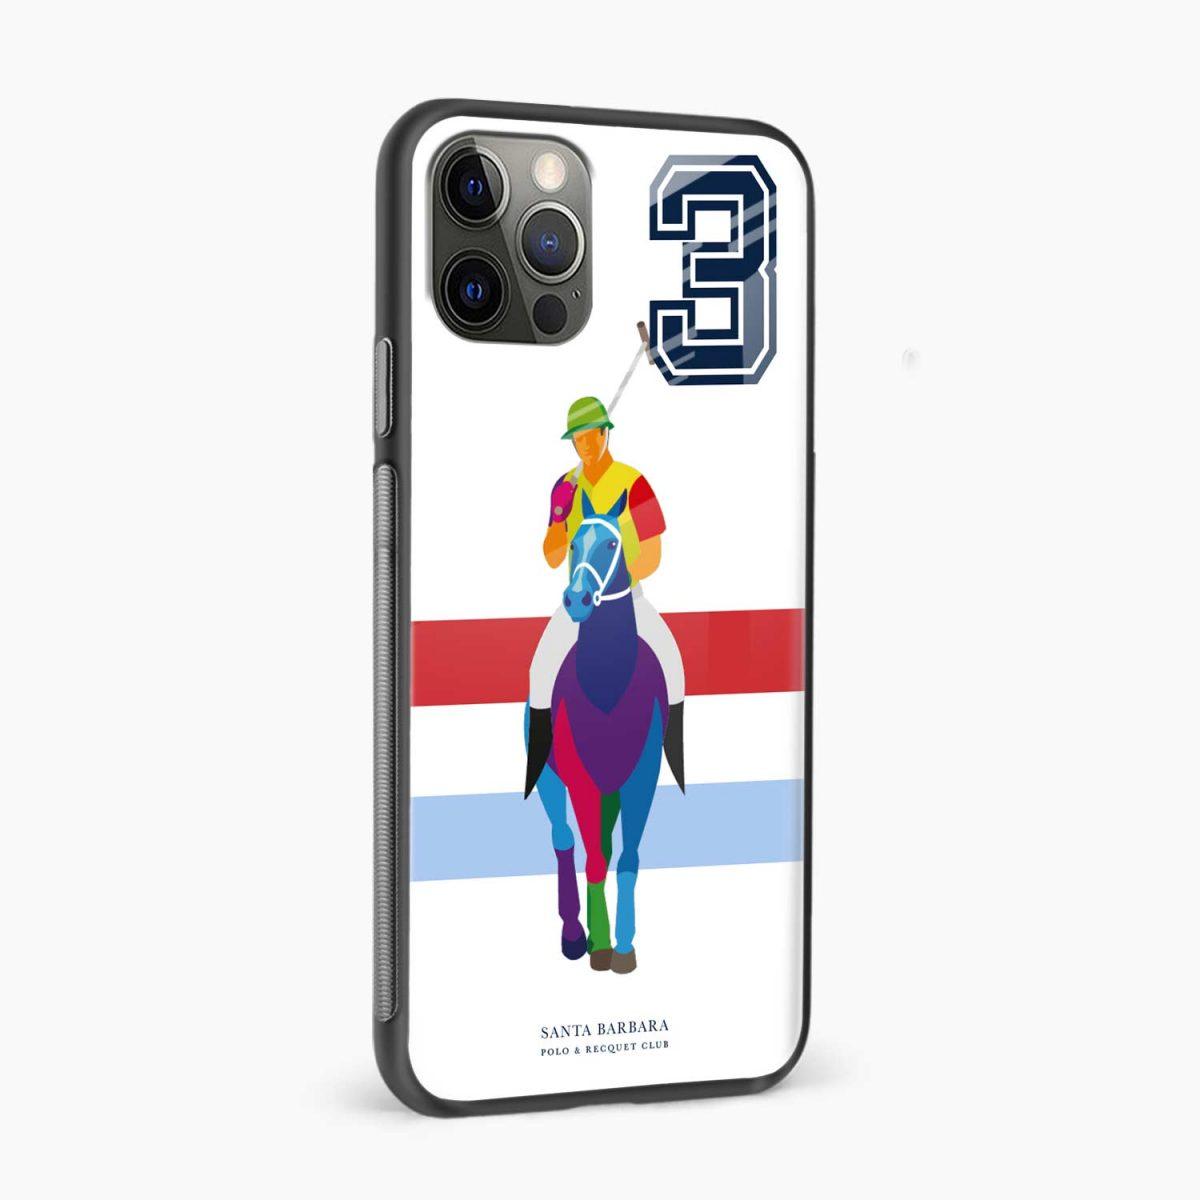 multicolor sant barbara polo iphone pro back cover side view